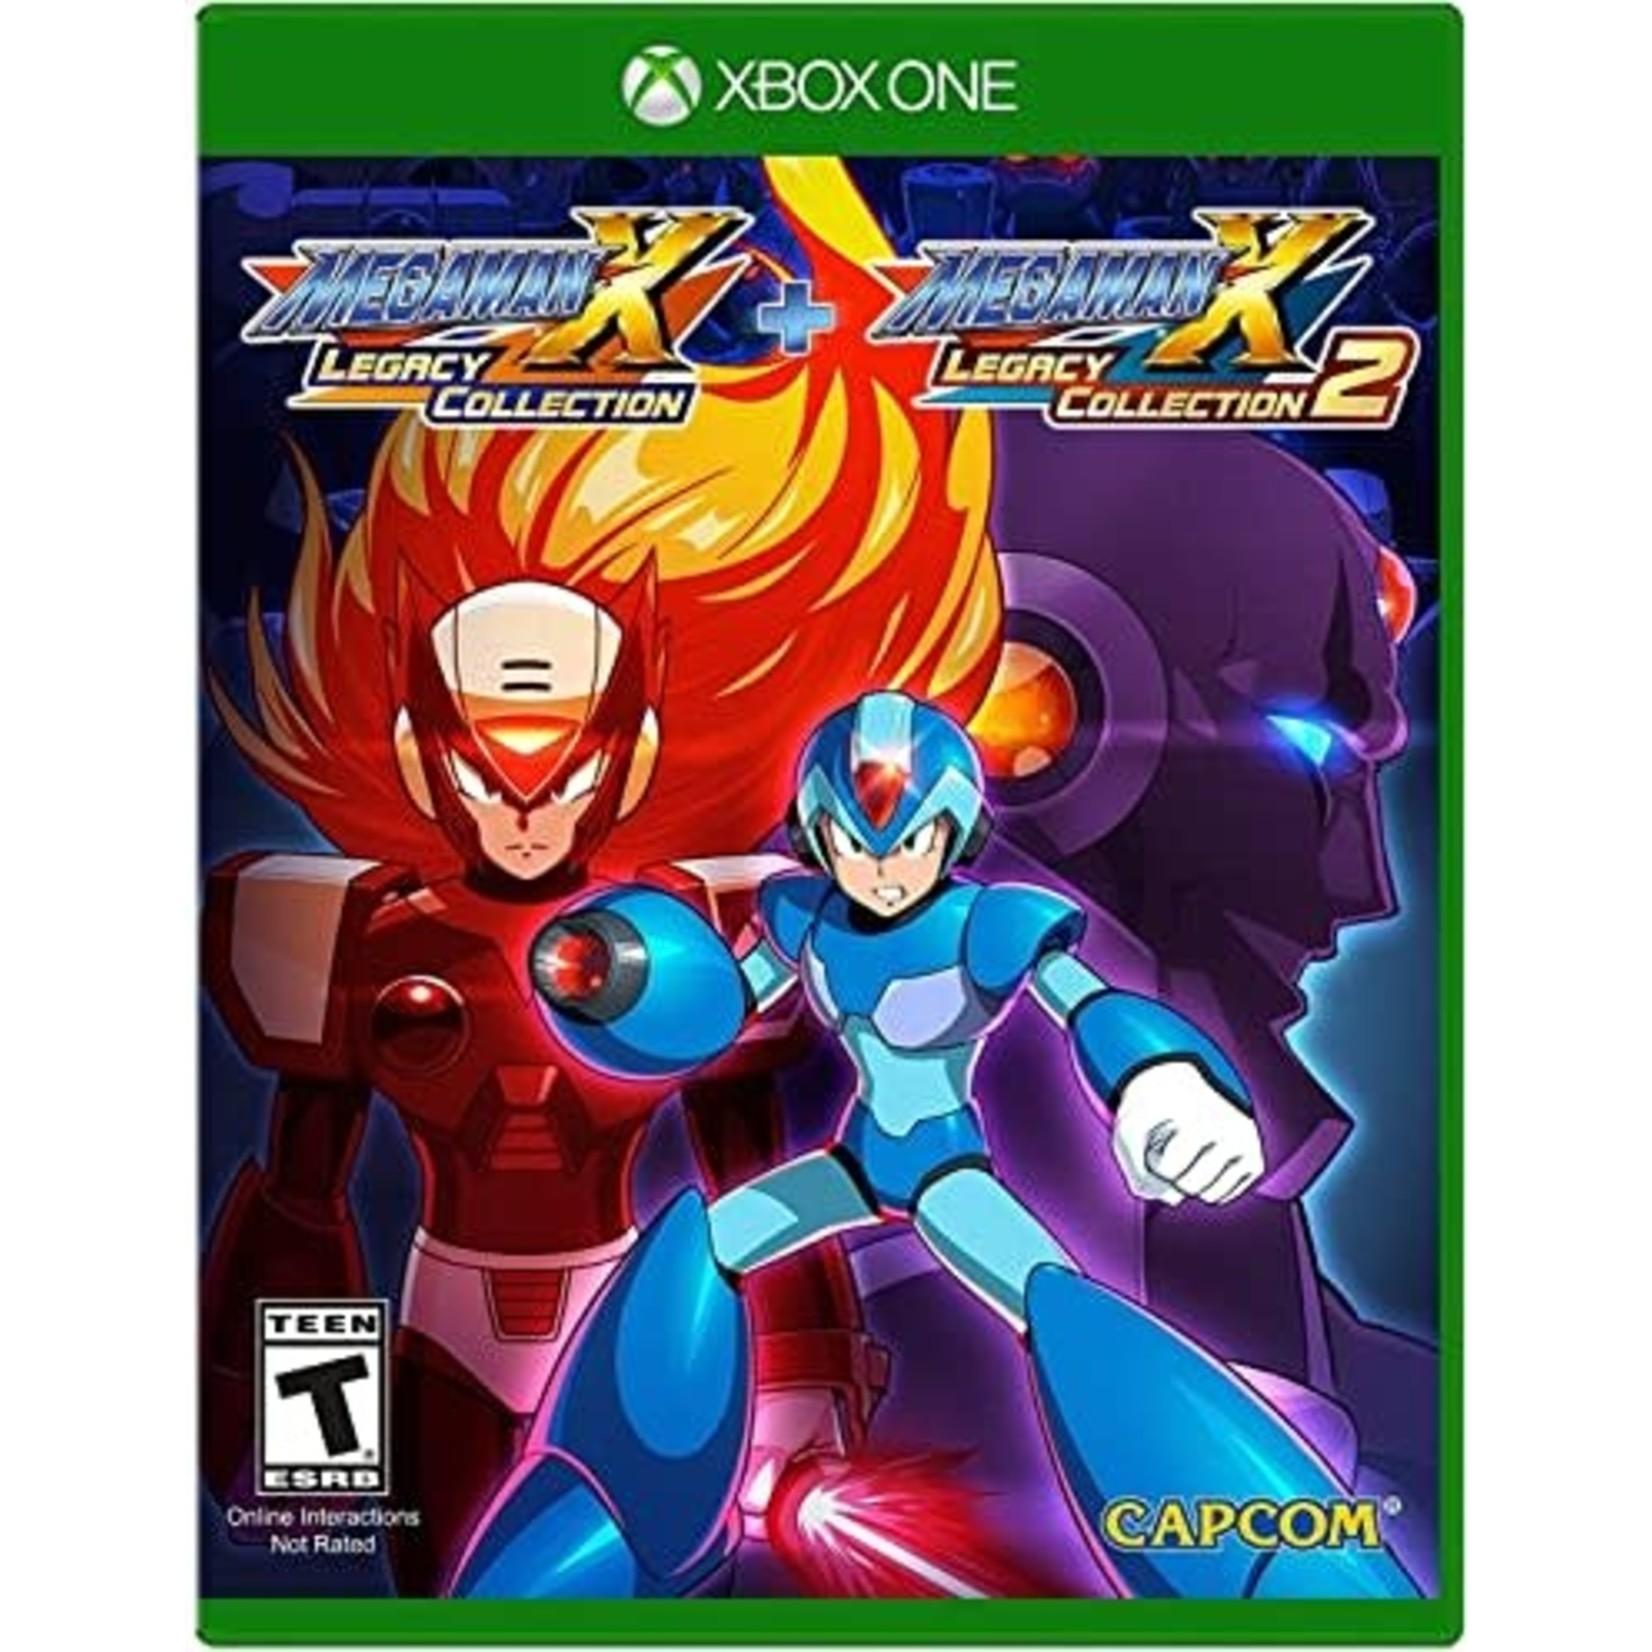 XB1-Megaman X Legacy Collection